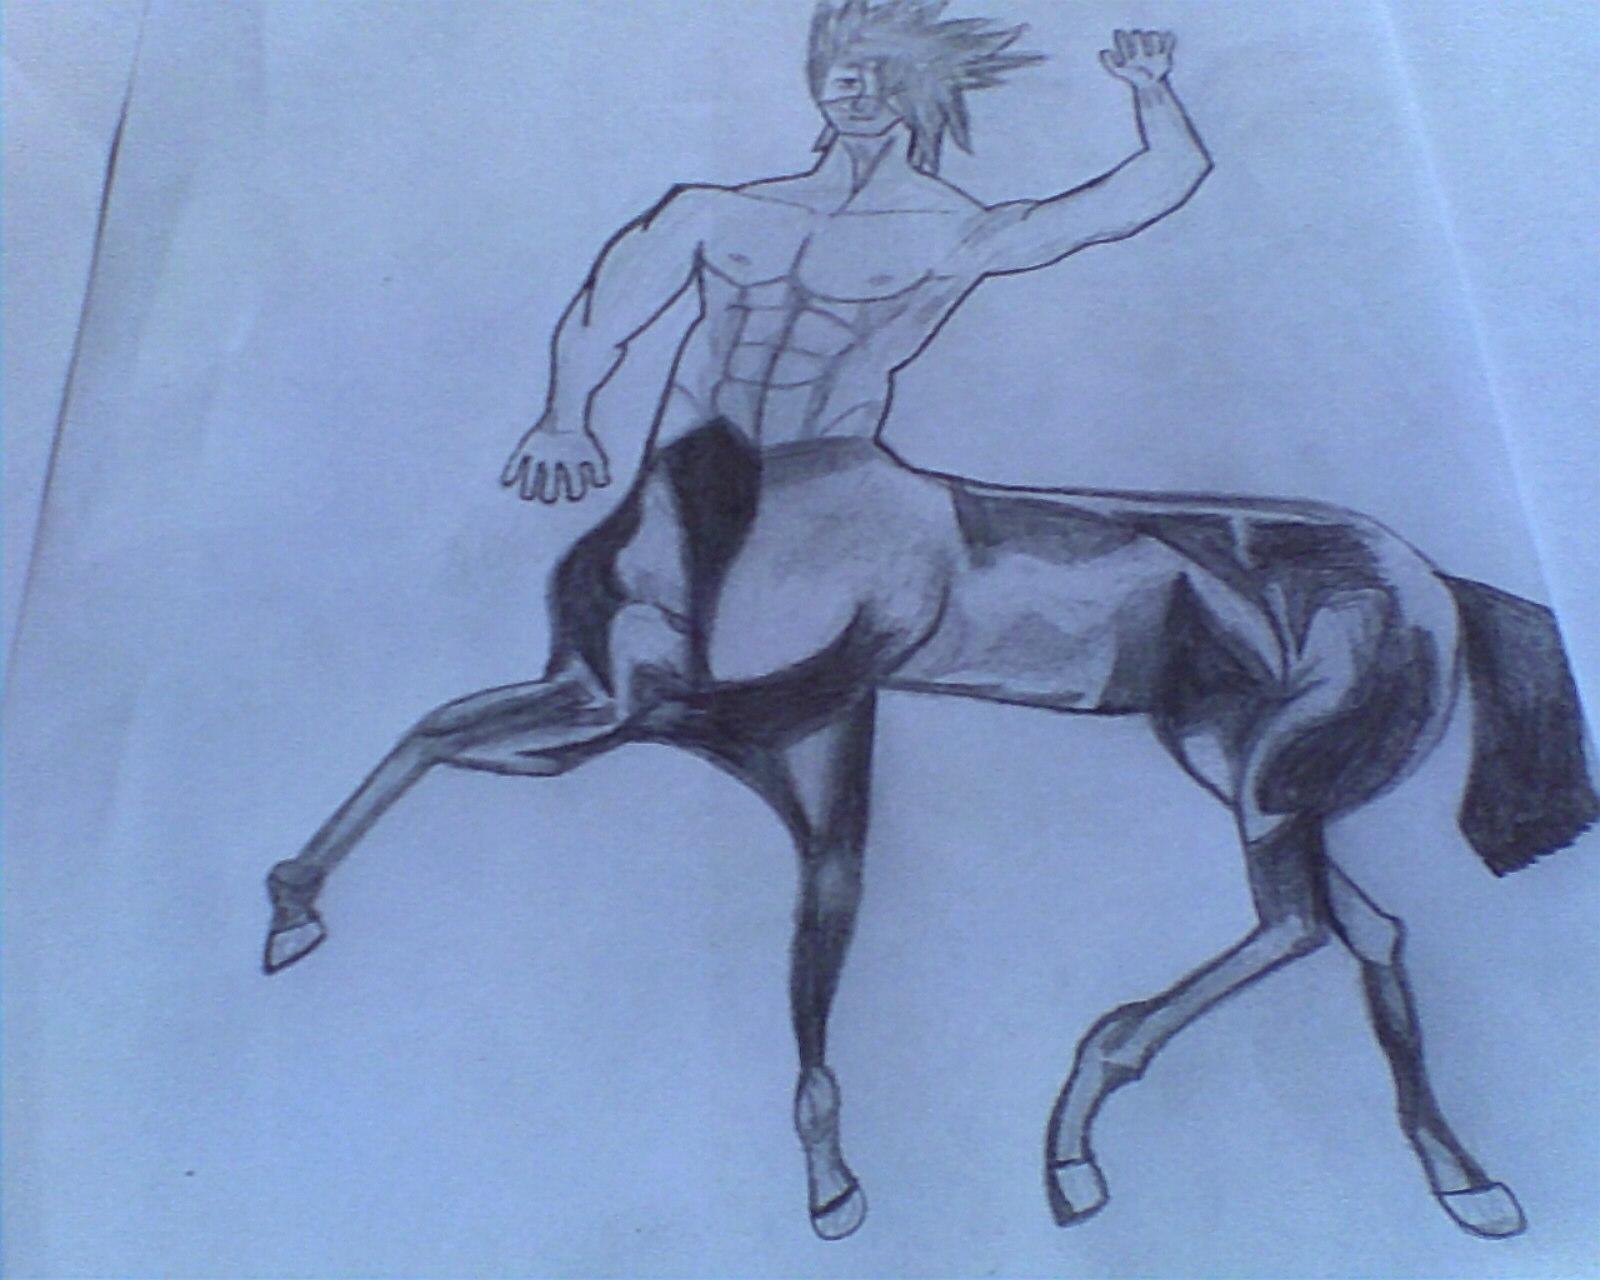 Kakashi Half Horse, Half Human by MssesAnimeMania on DeviantArt